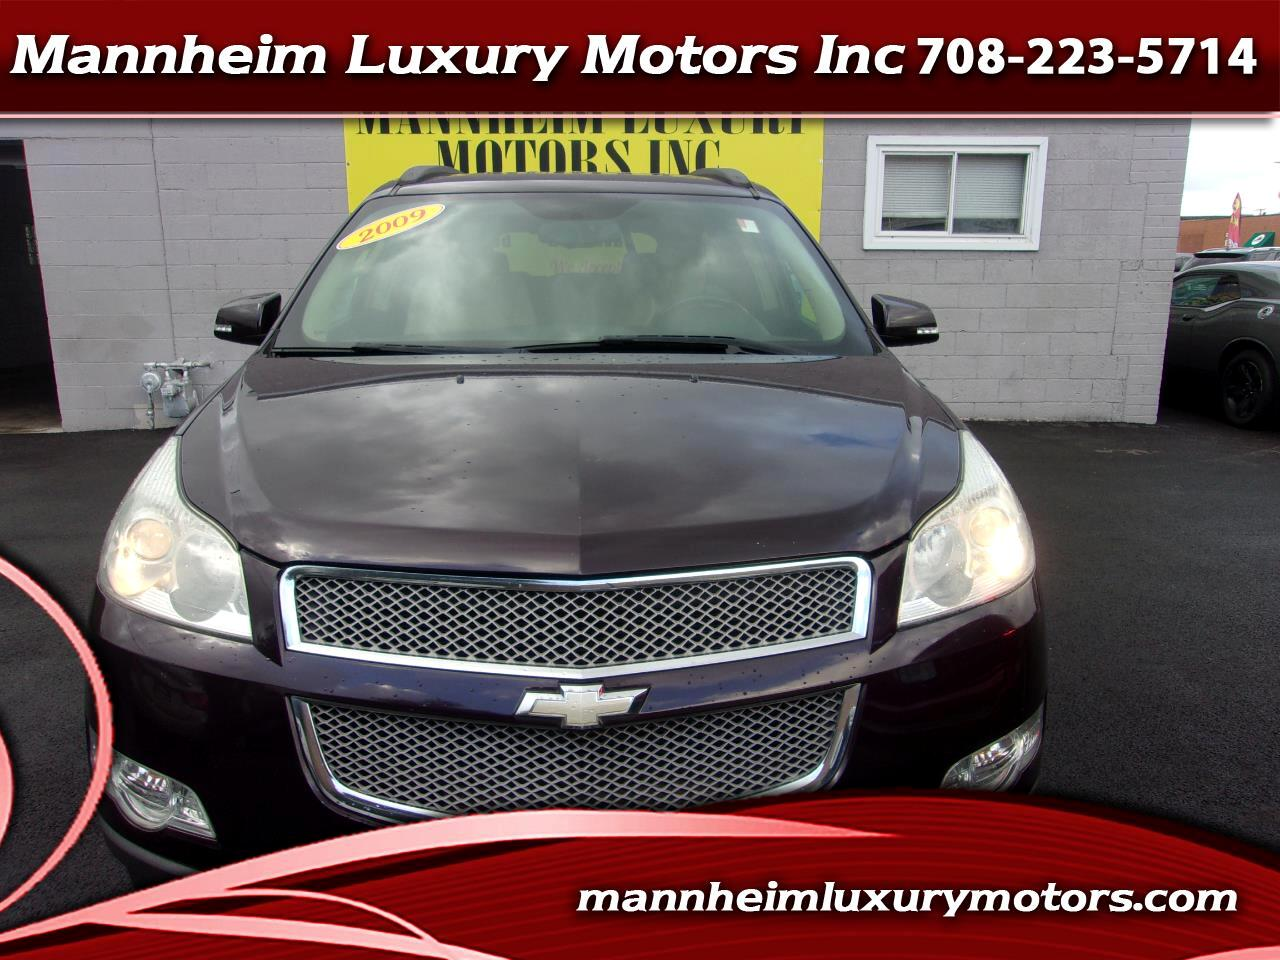 Chevrolet Traverse FWD 4dr LTZ 2009